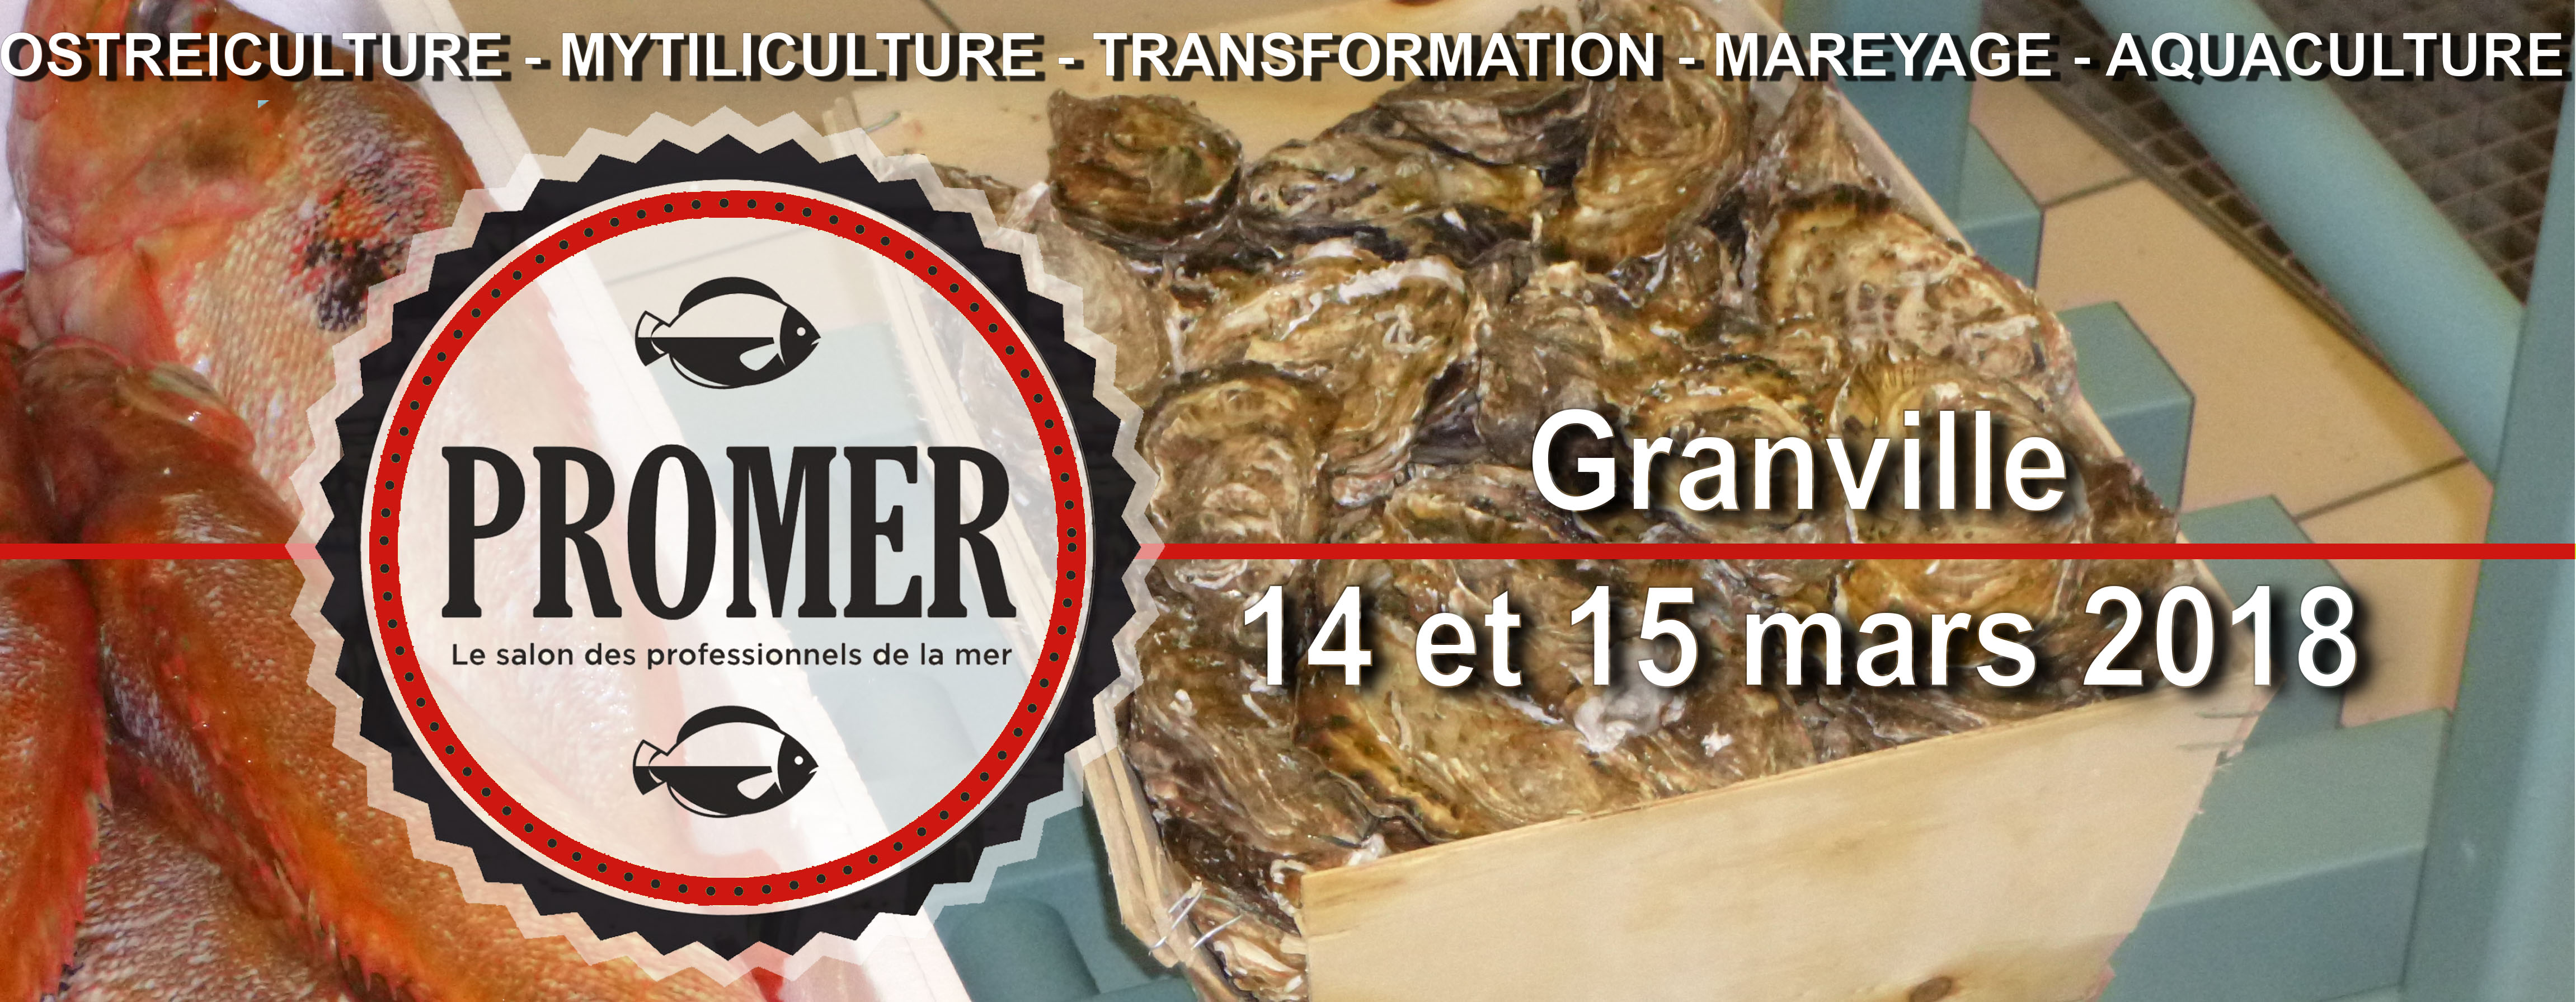 Plasnet rea actualit s for Salon mer et vigne strasbourg 2017